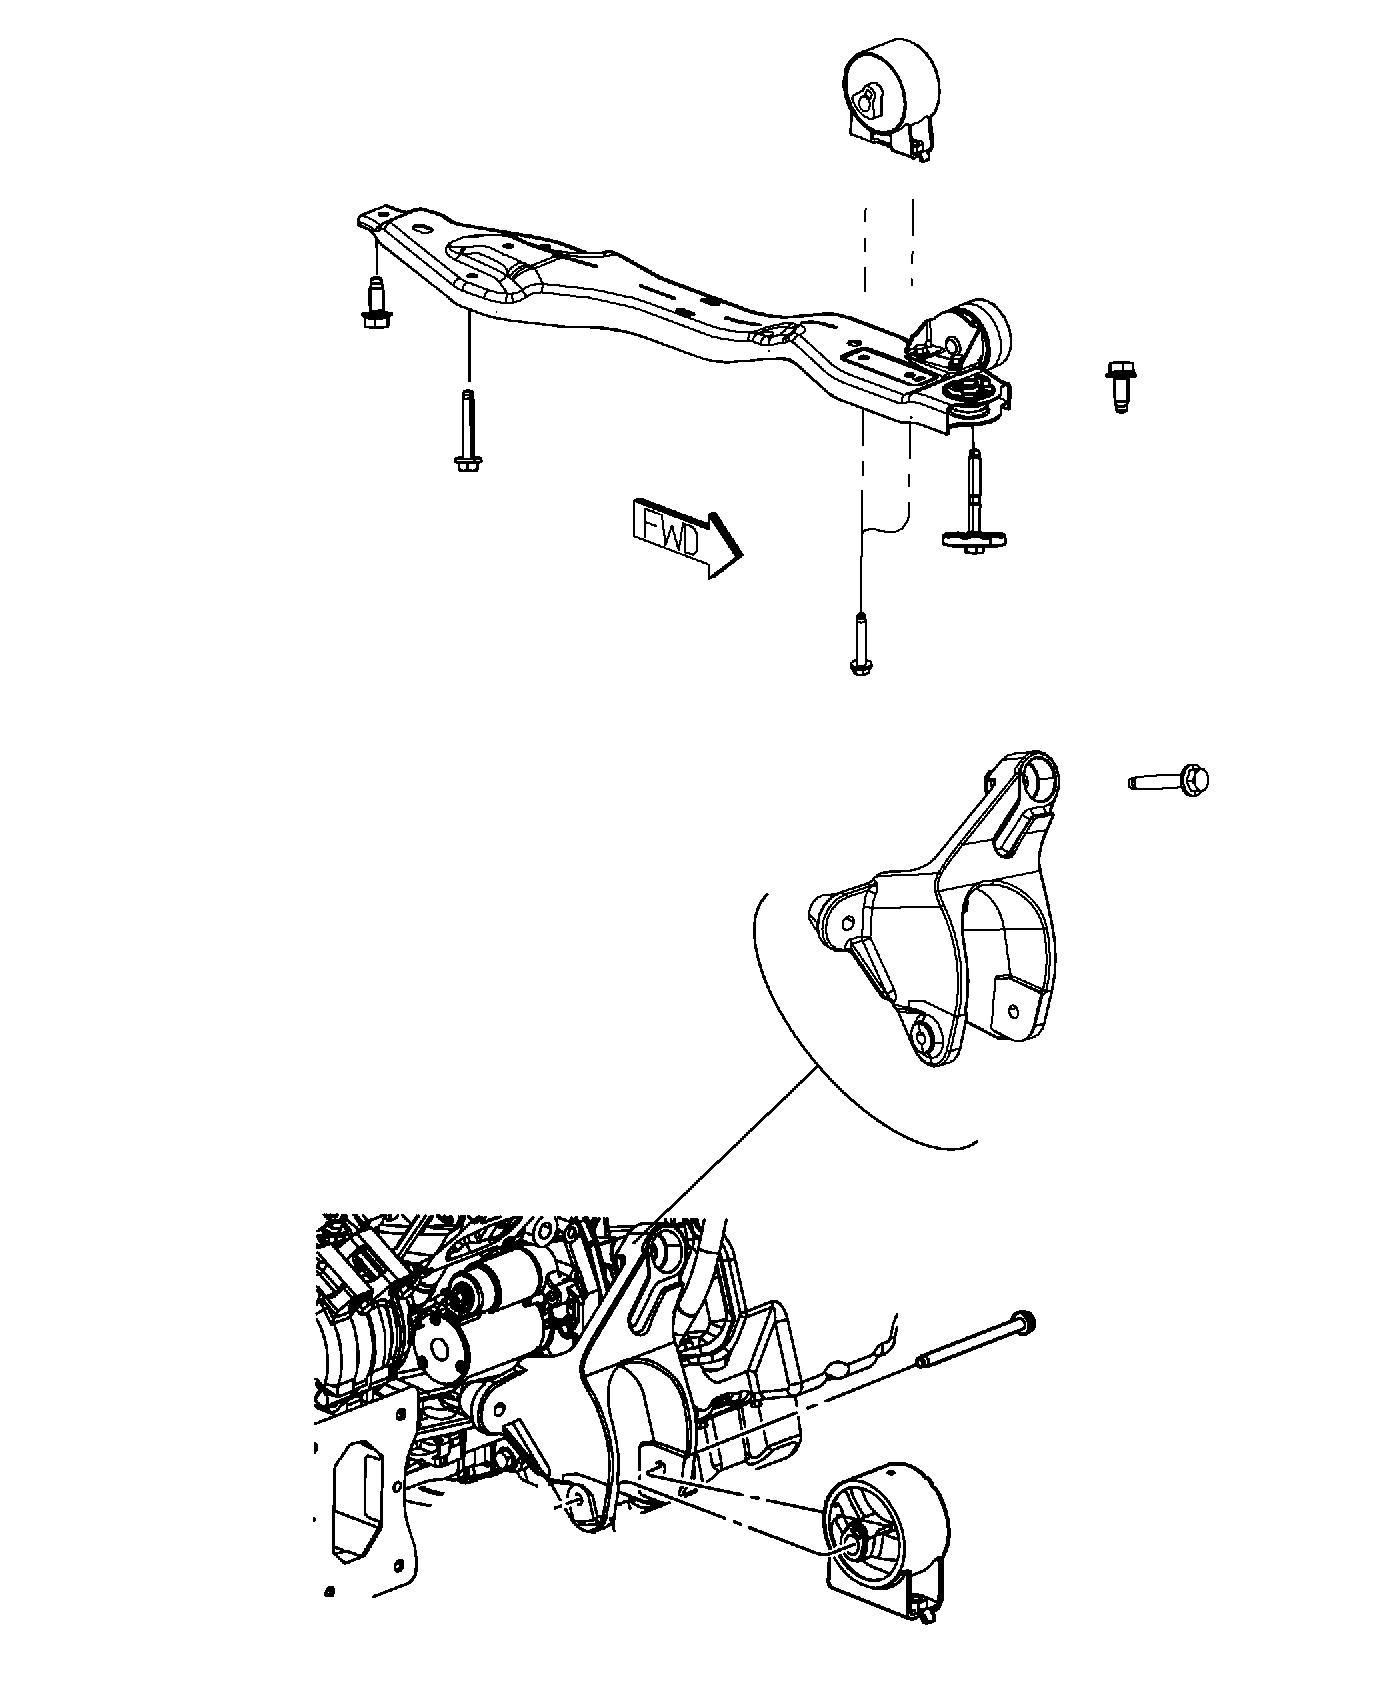 Dodge Grand Caravan Damper. Engine mount. [tow hooks